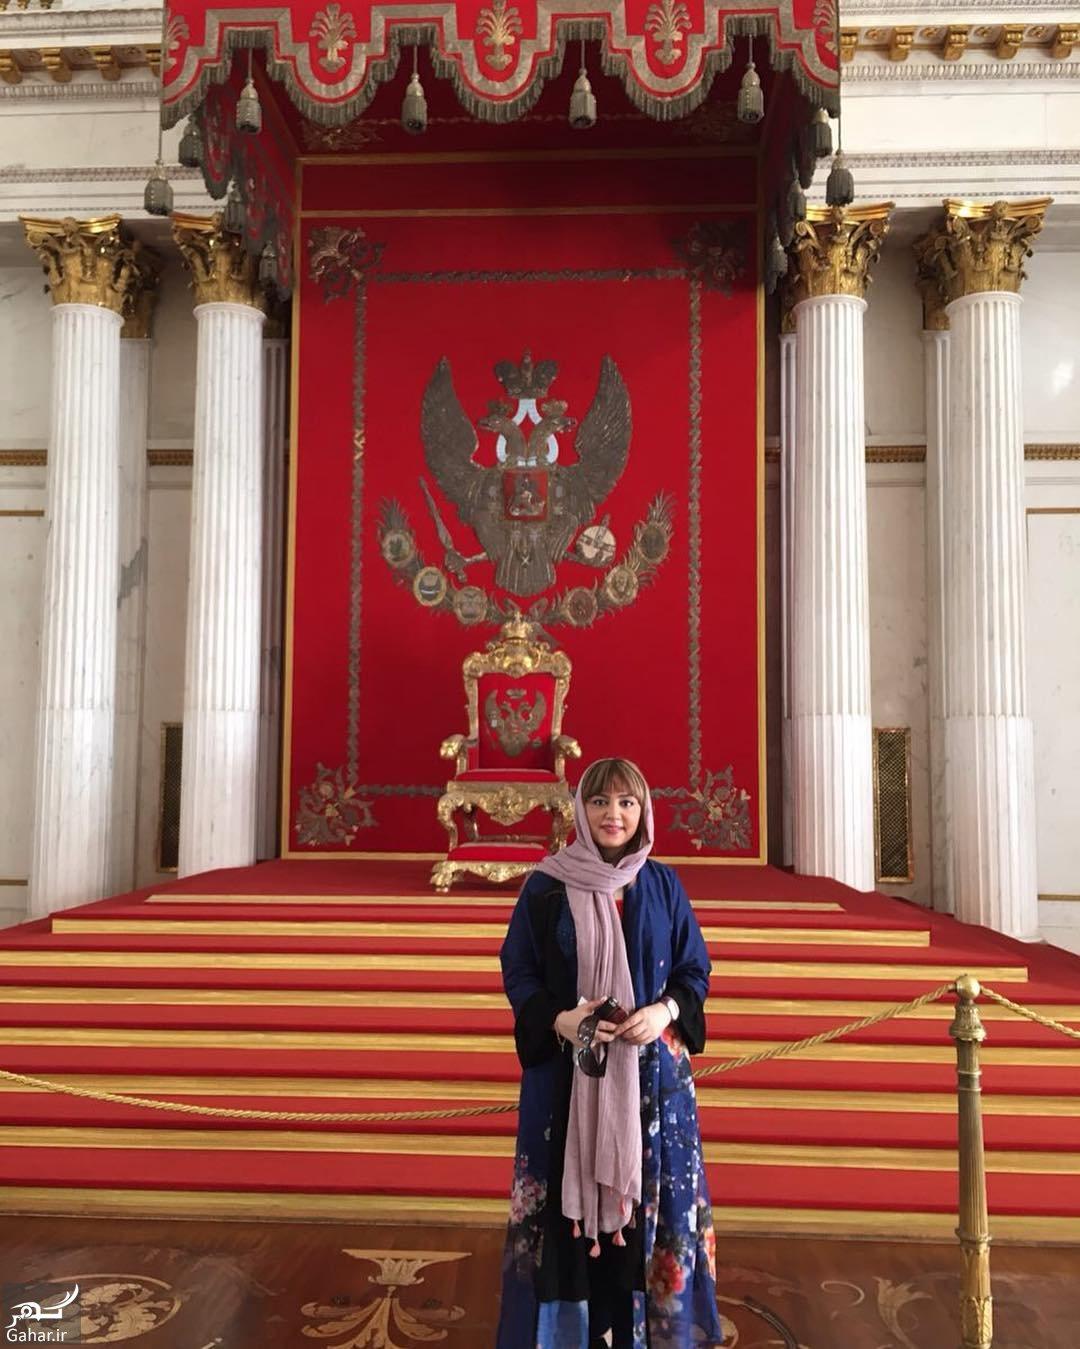 225501 Gahar ir سفر متفاوت لیلا برخورداری به روسیه + عکس های دیدنی